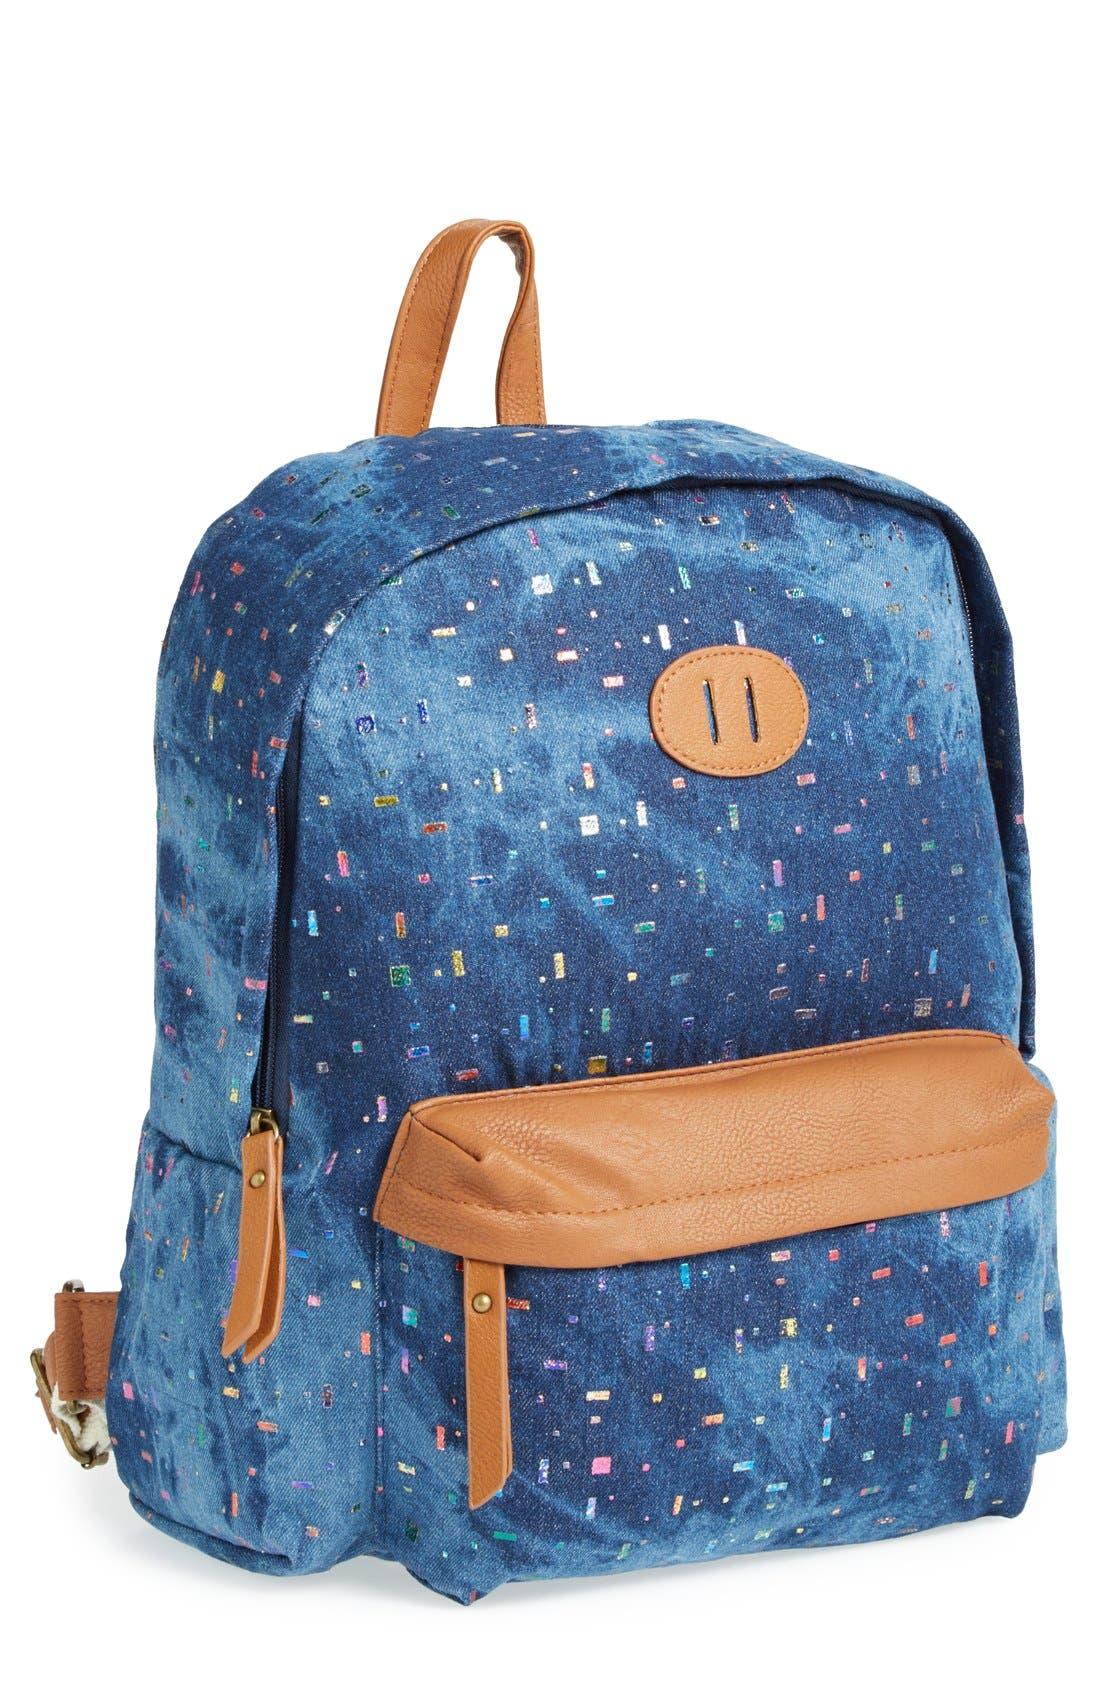 Alternate Image 1 Selected - Steve Madden Canvas Backpack